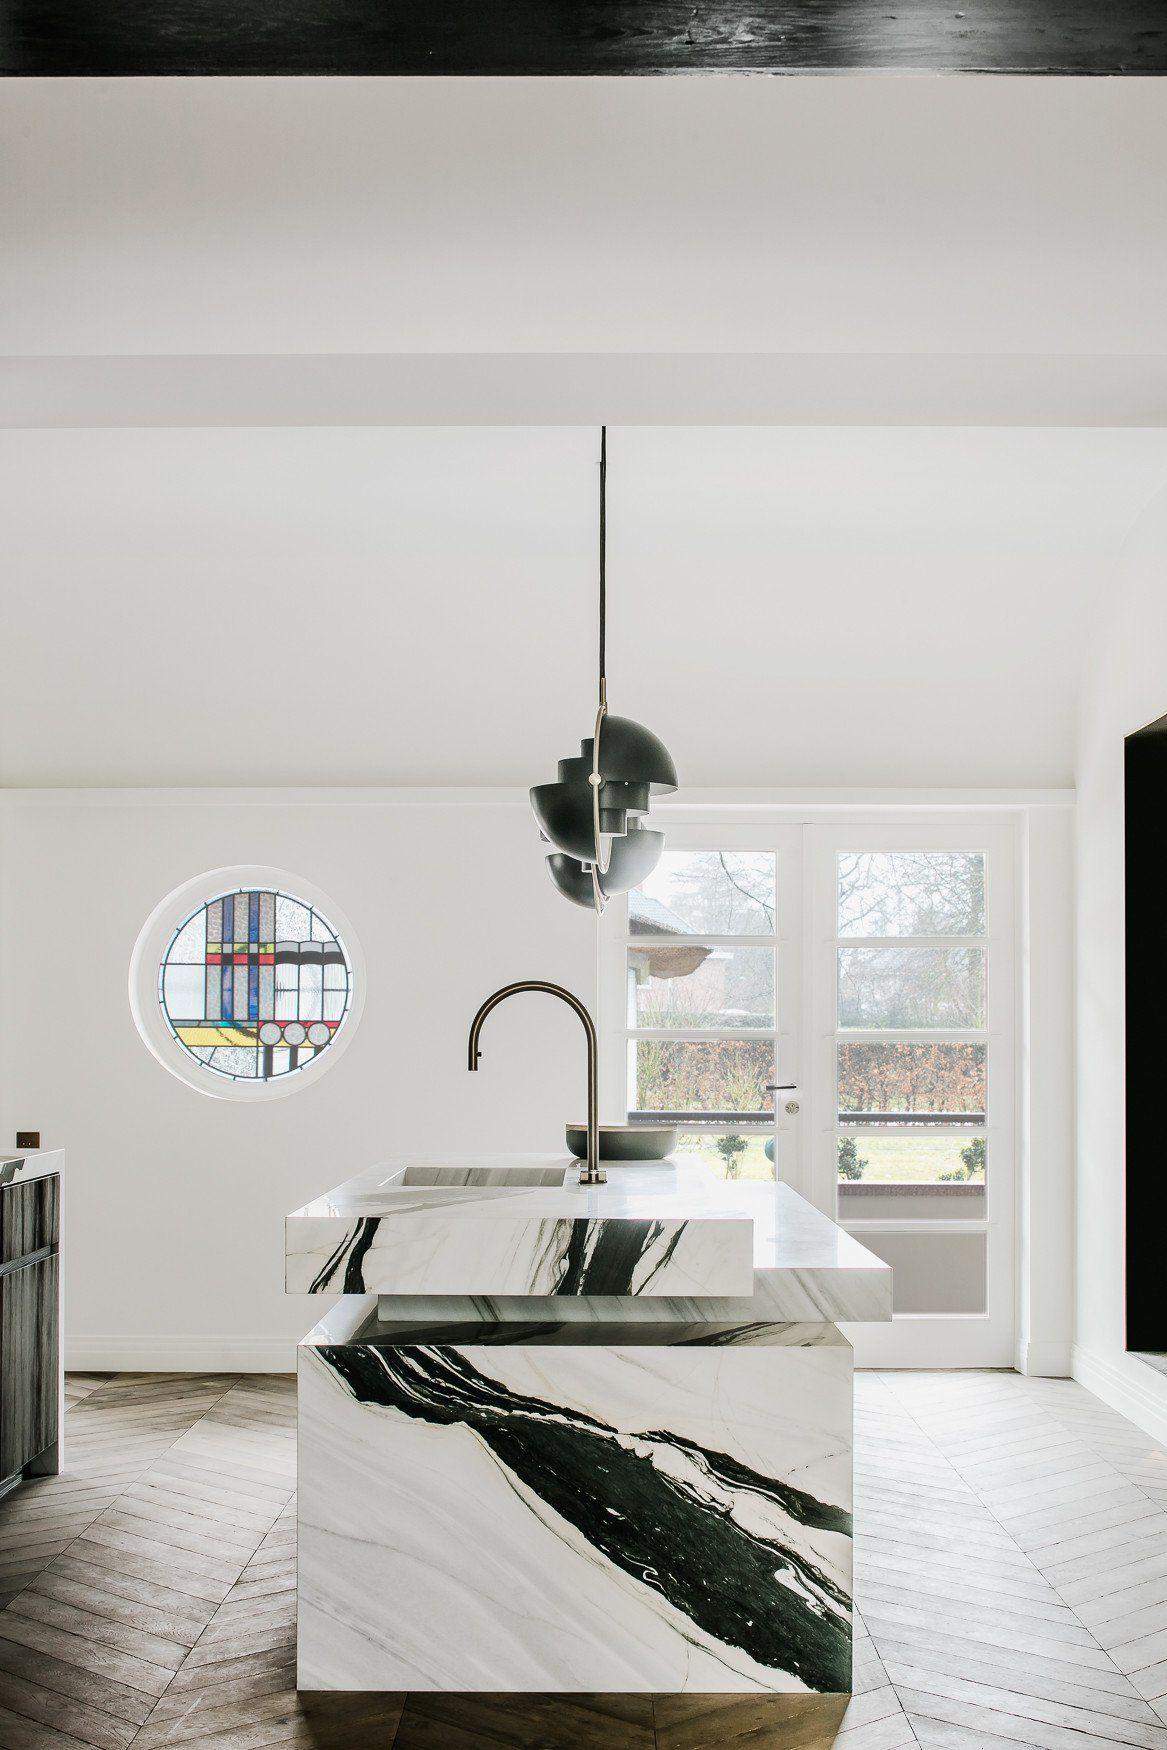 Villa de Nil Interior Joseph Dirand obumex Kitchen